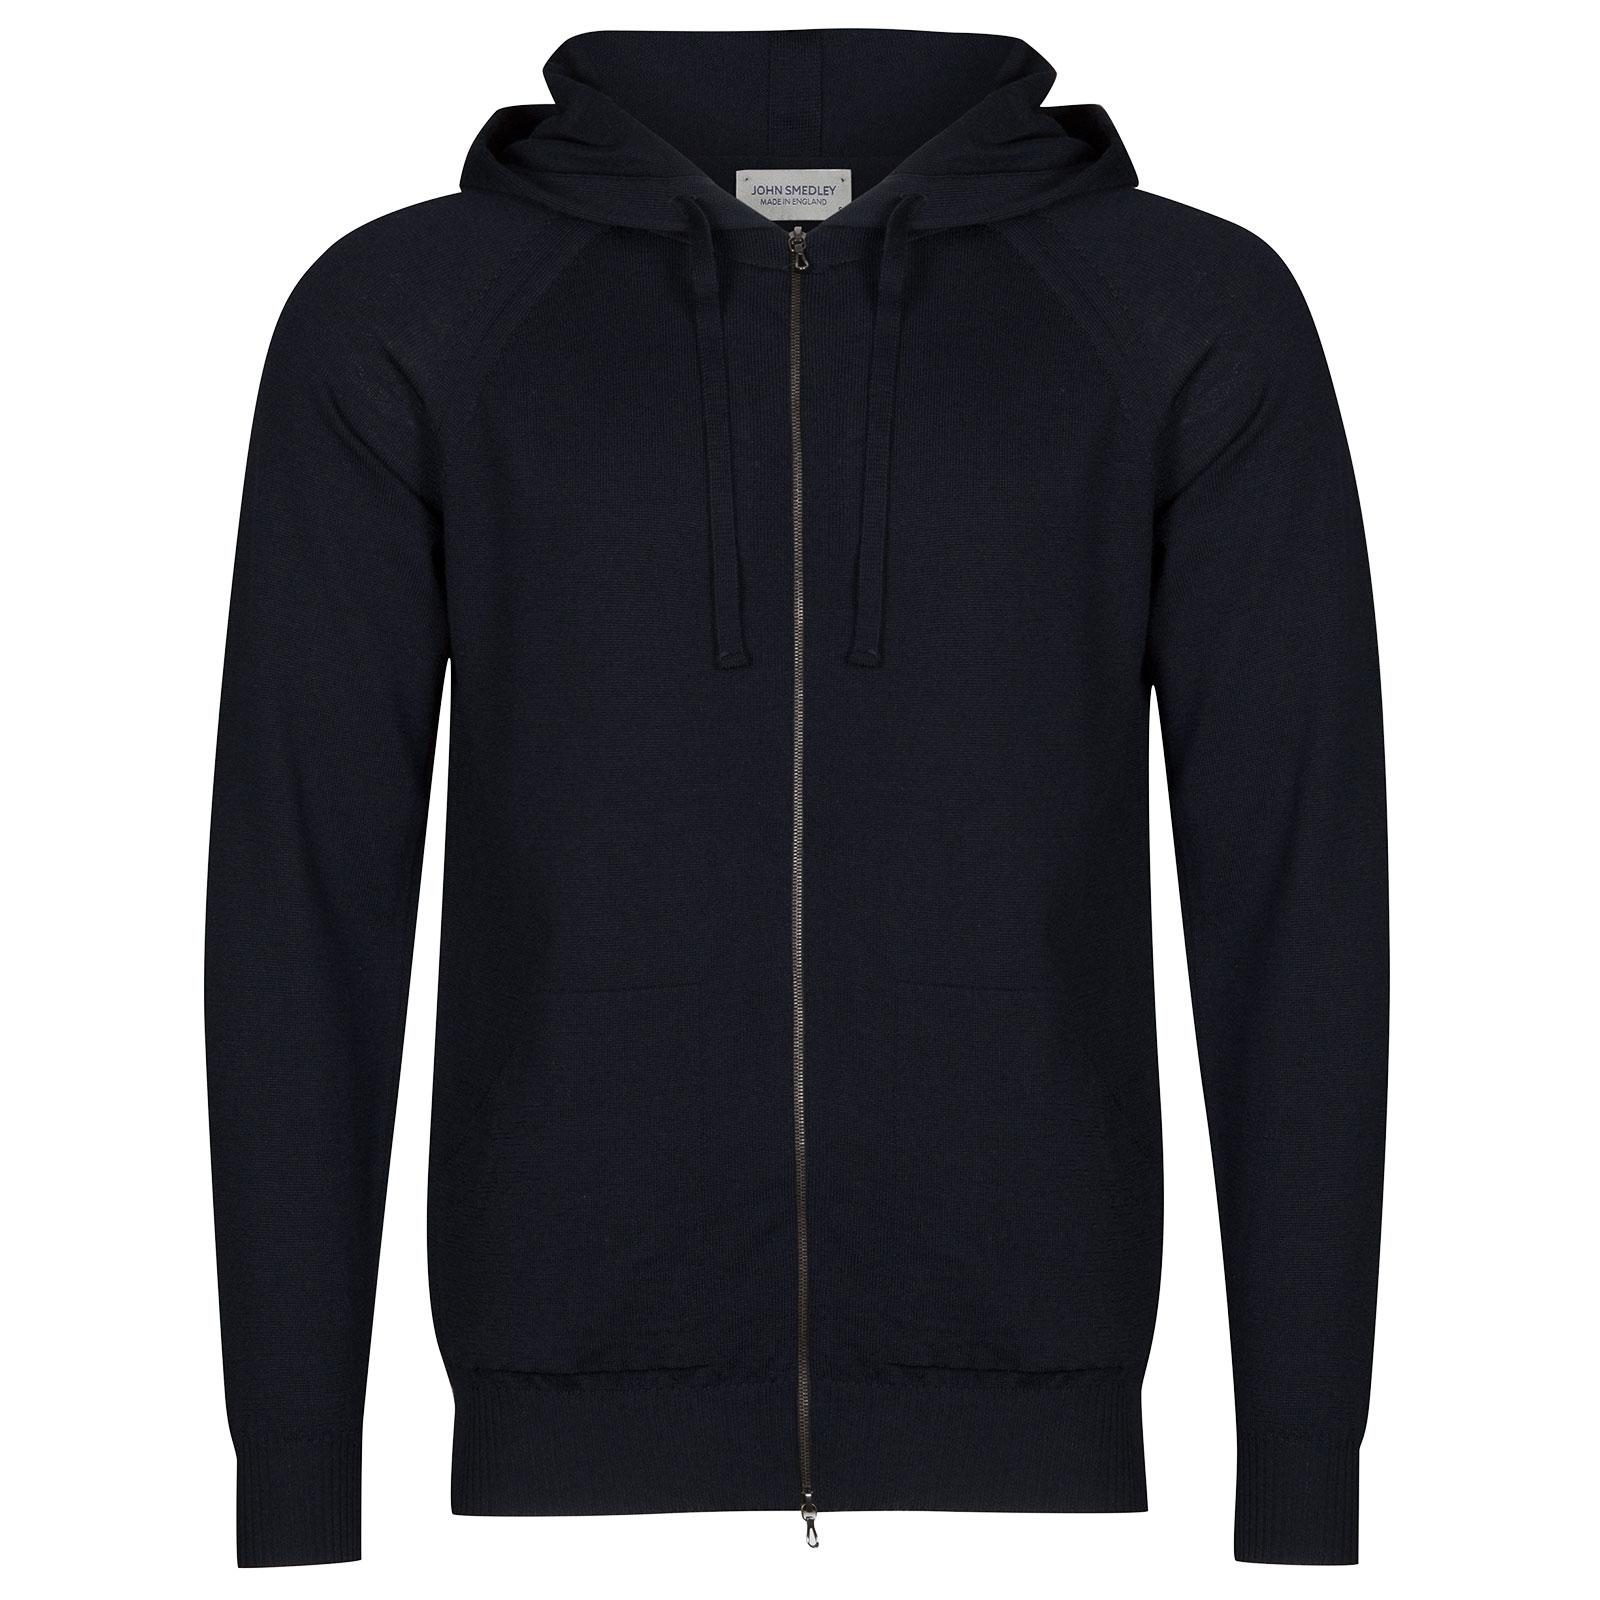 John Smedley Reservoir Merino Wool Jacket in Midnight-M